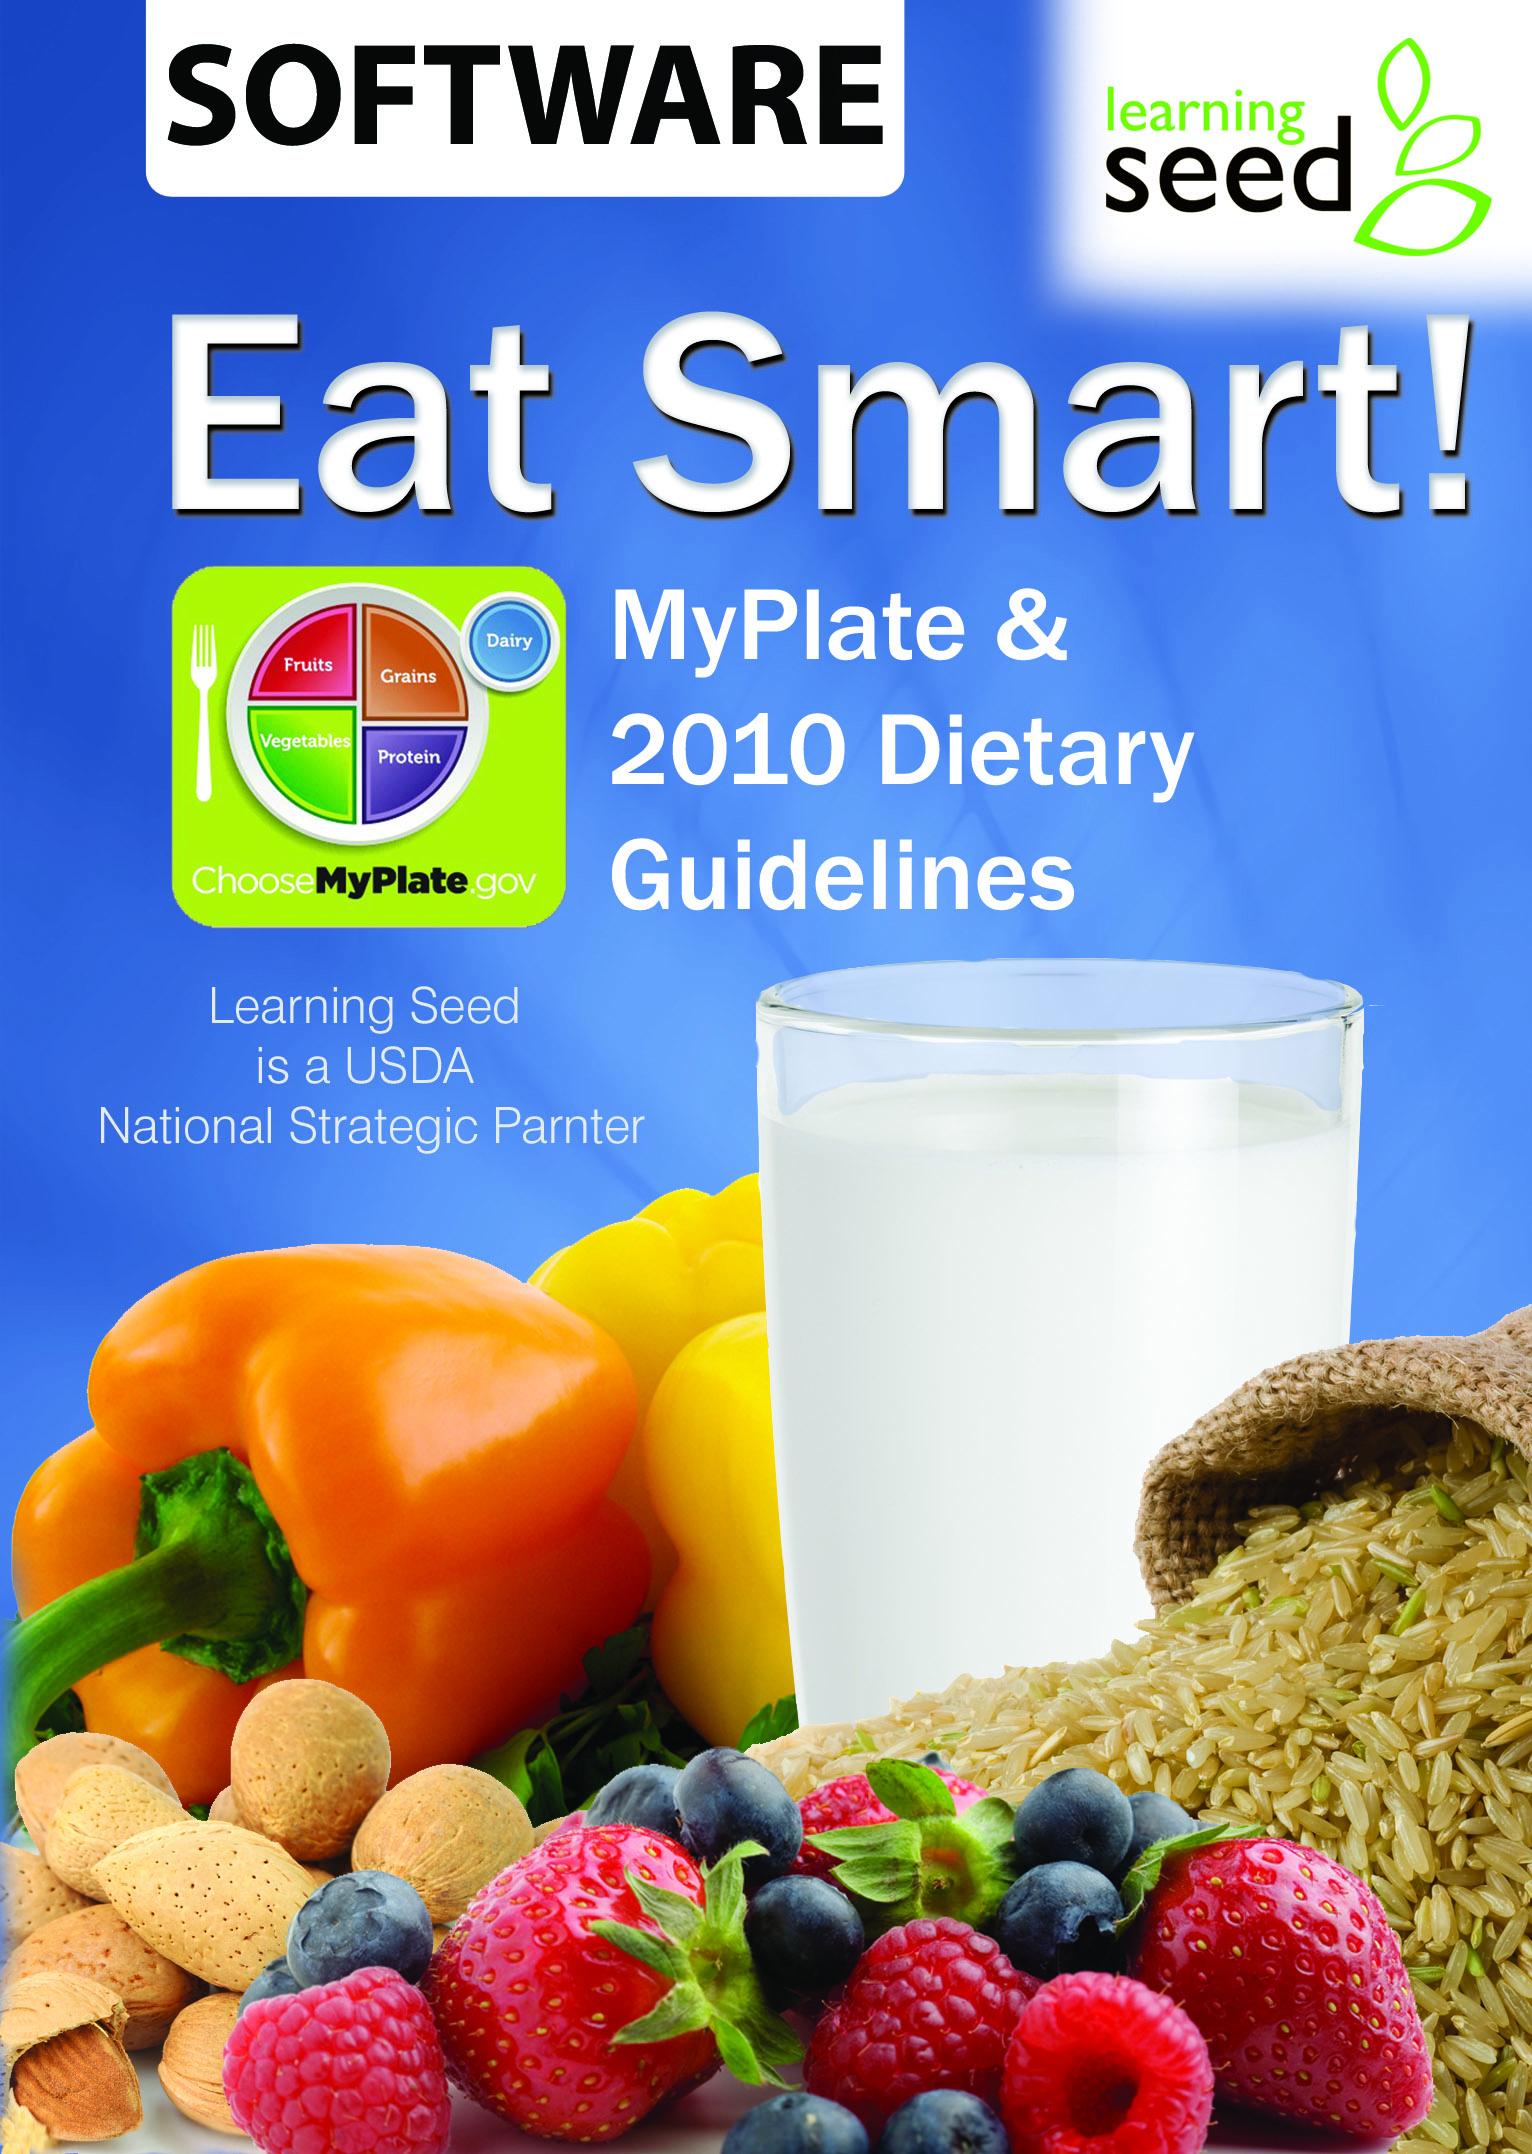 Eat Smart Software